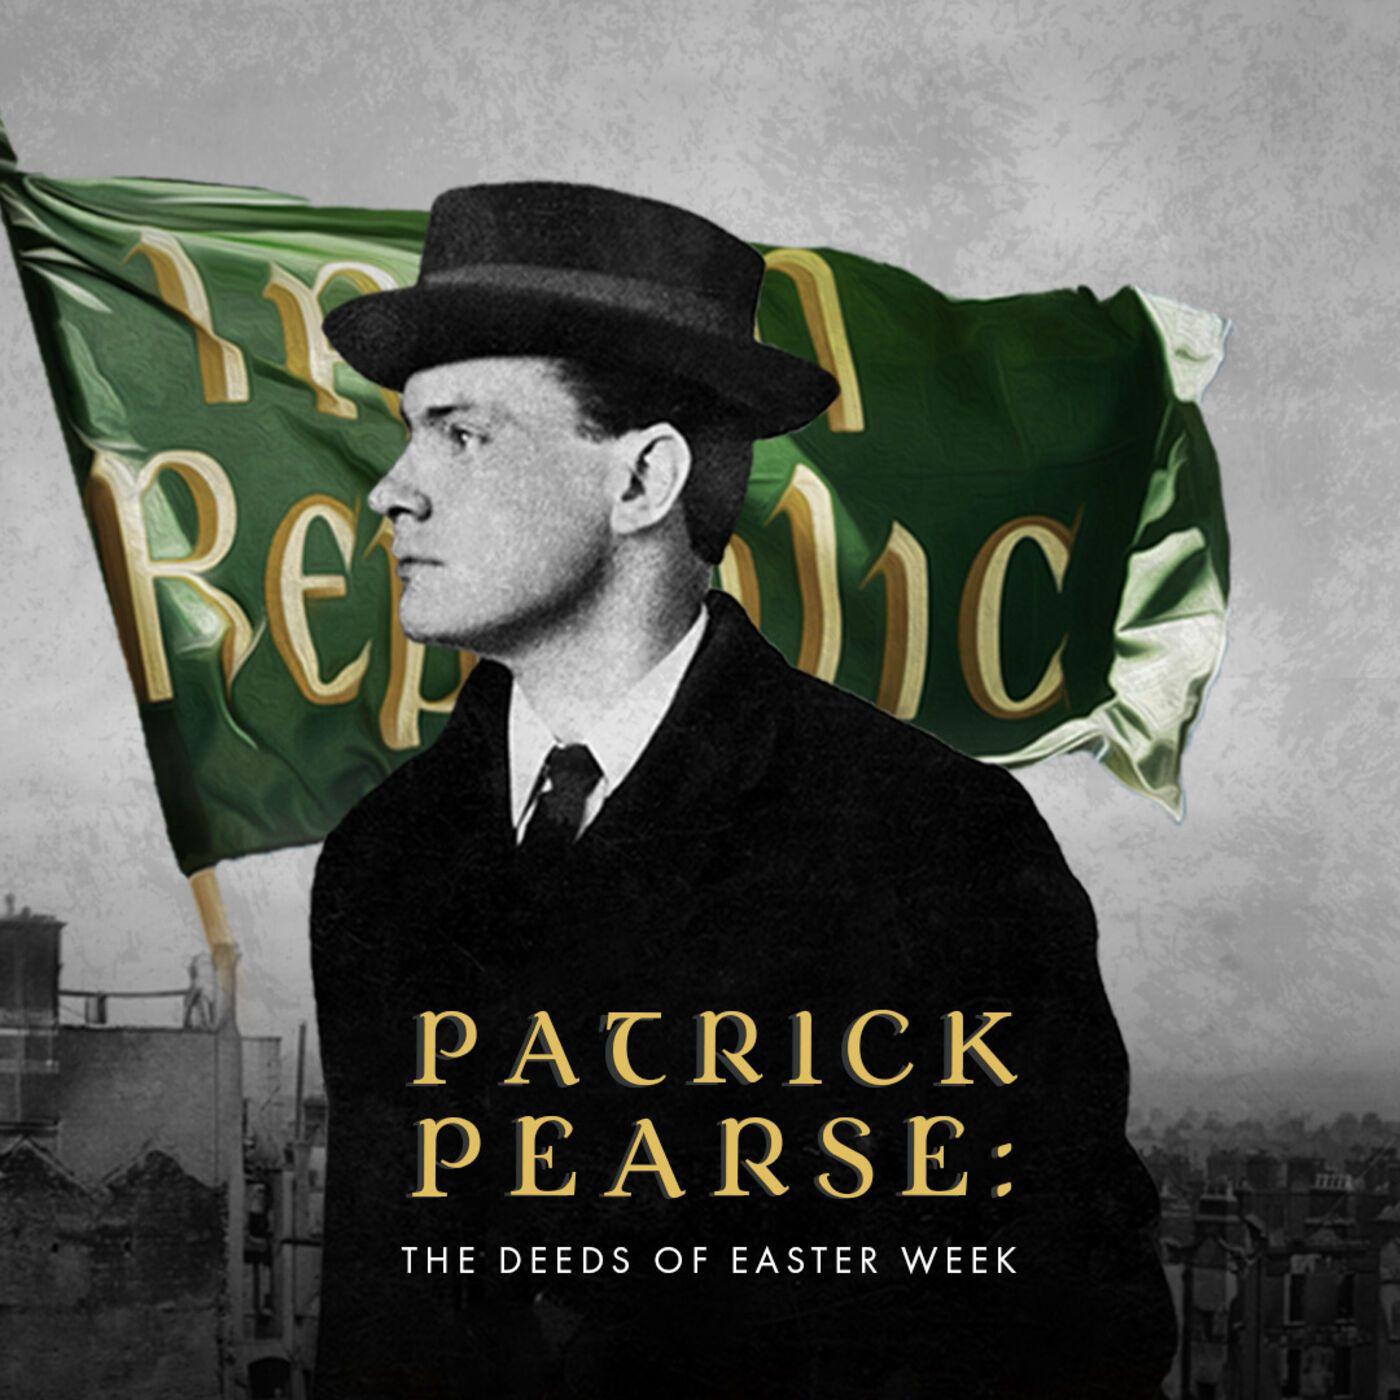 Patrick Pearse: The Deeds of Easter Week